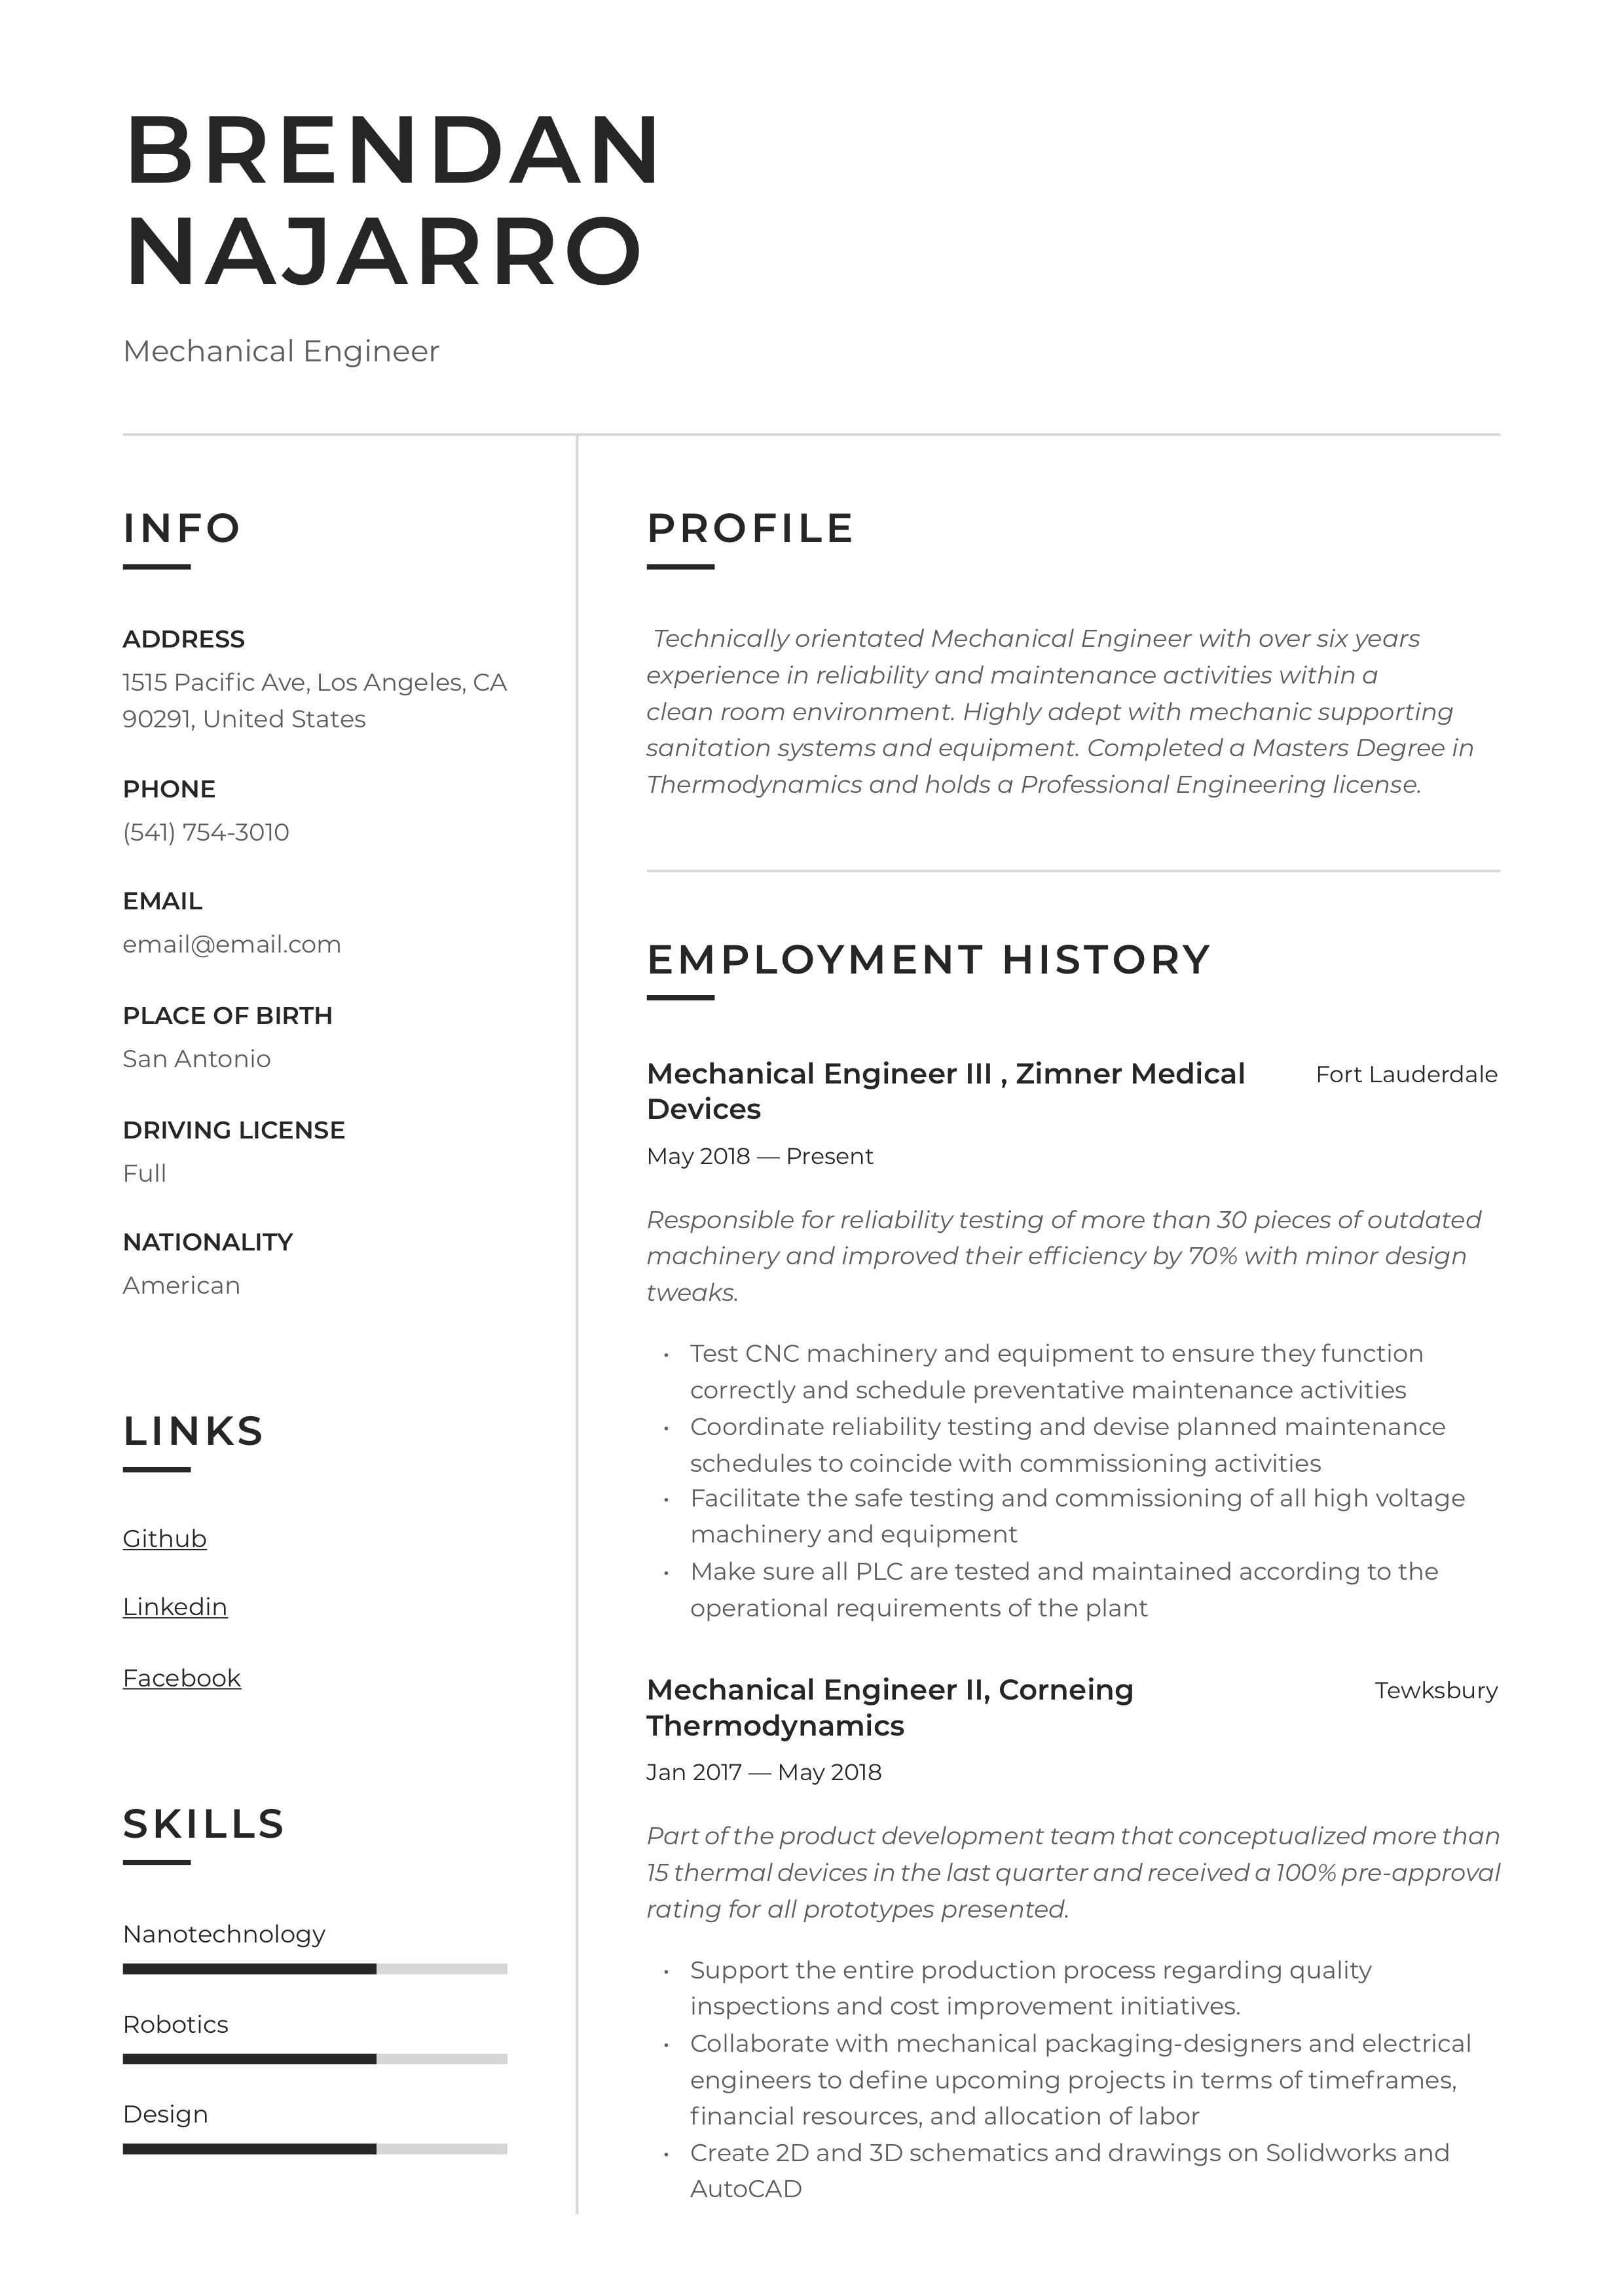 10 best resume writing service engineers